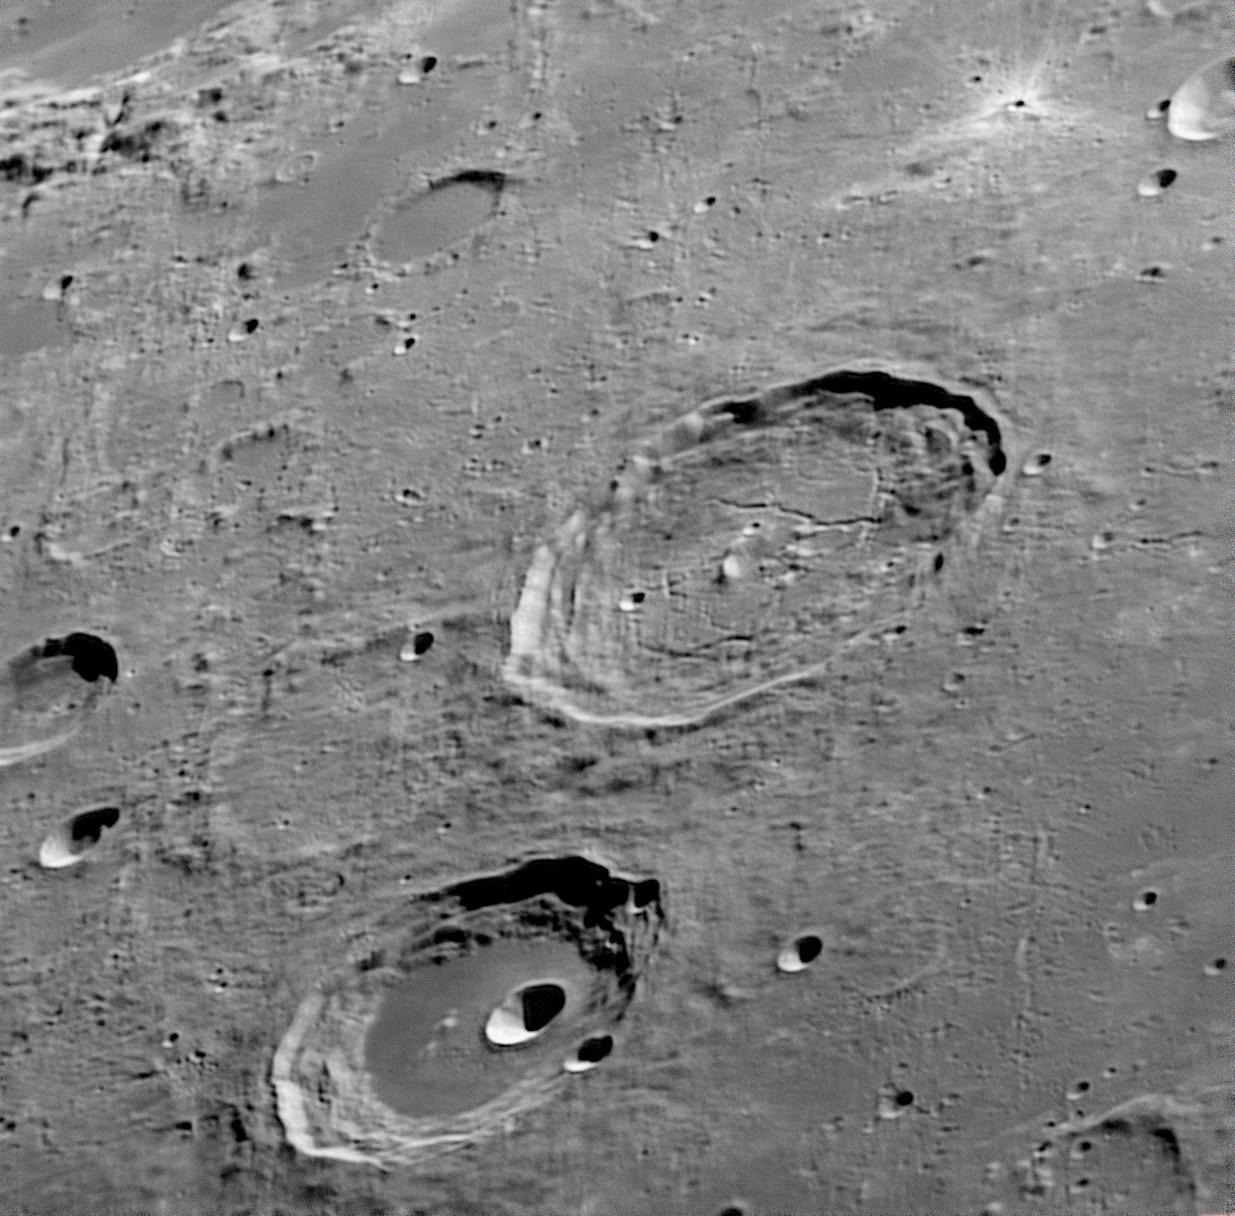 Atlas et hercule du 21 mai 2018